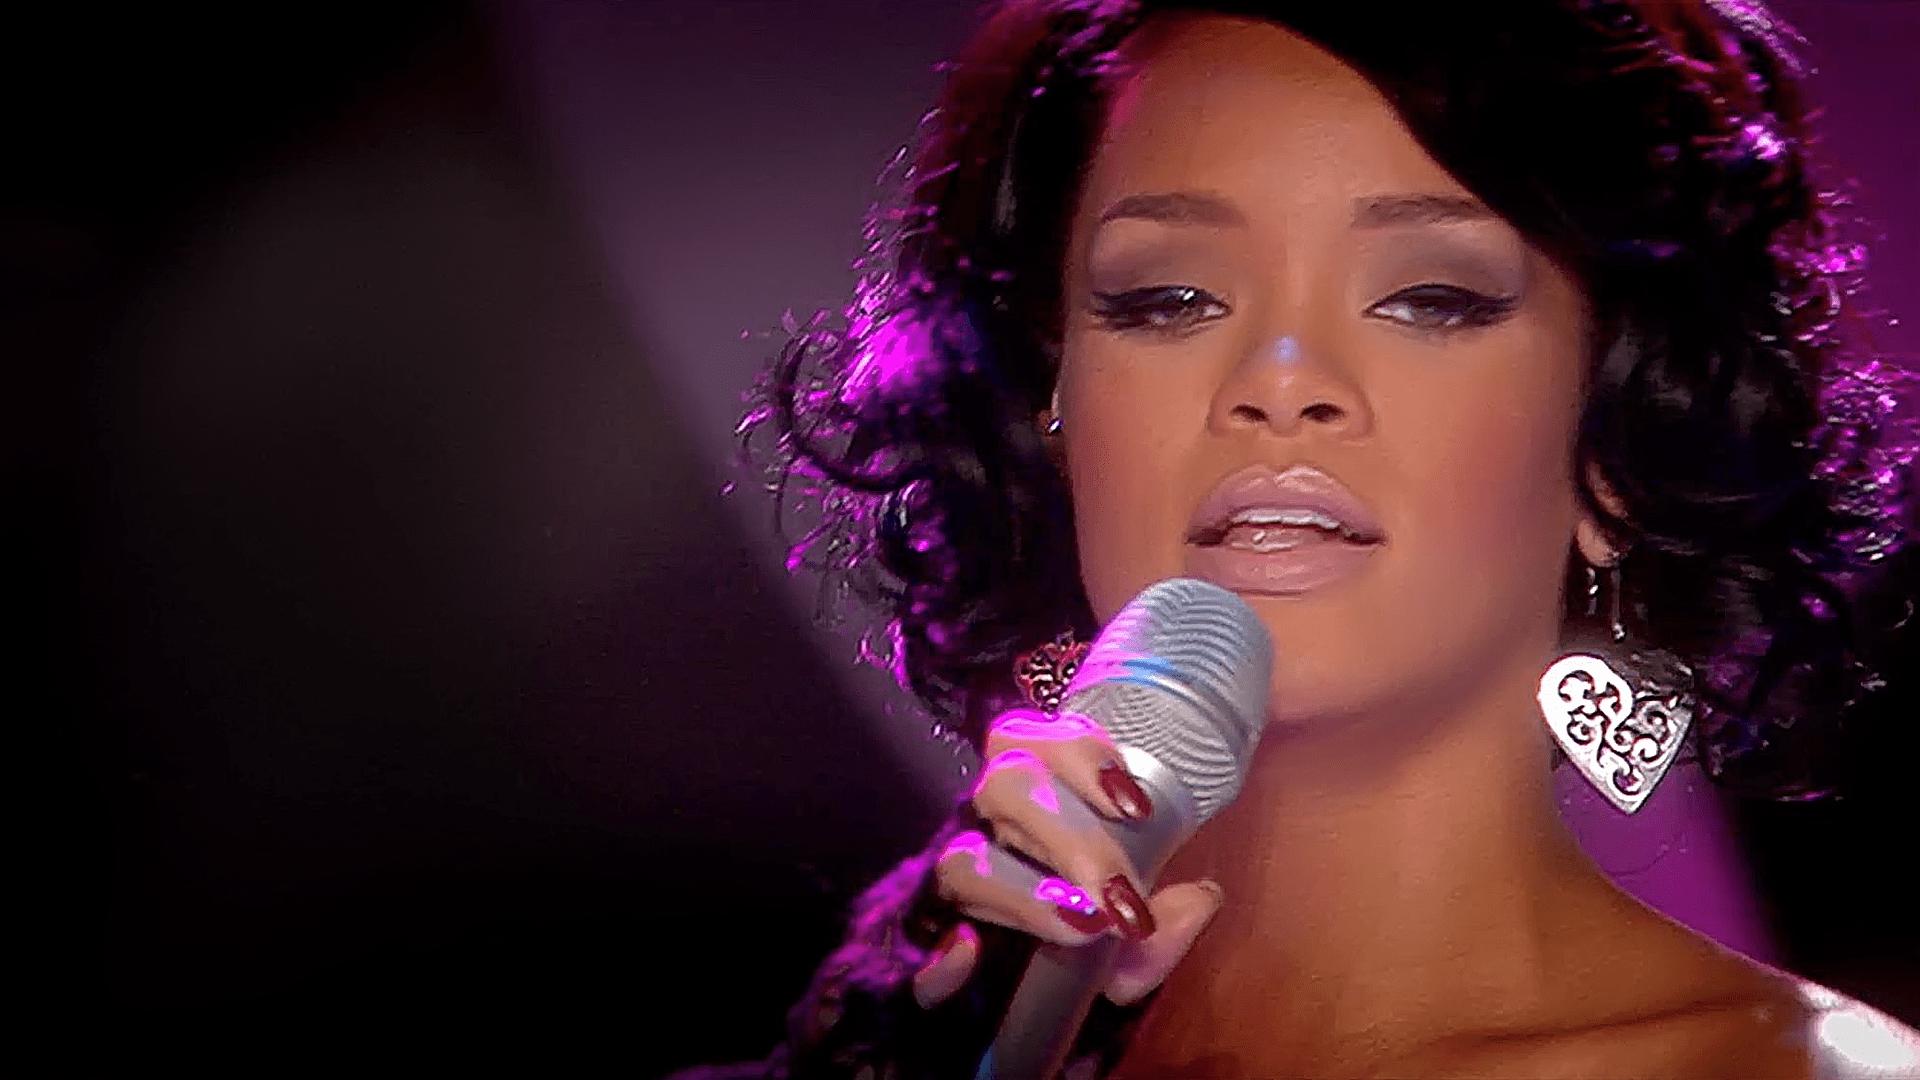 Rihanna At The World Music Awards